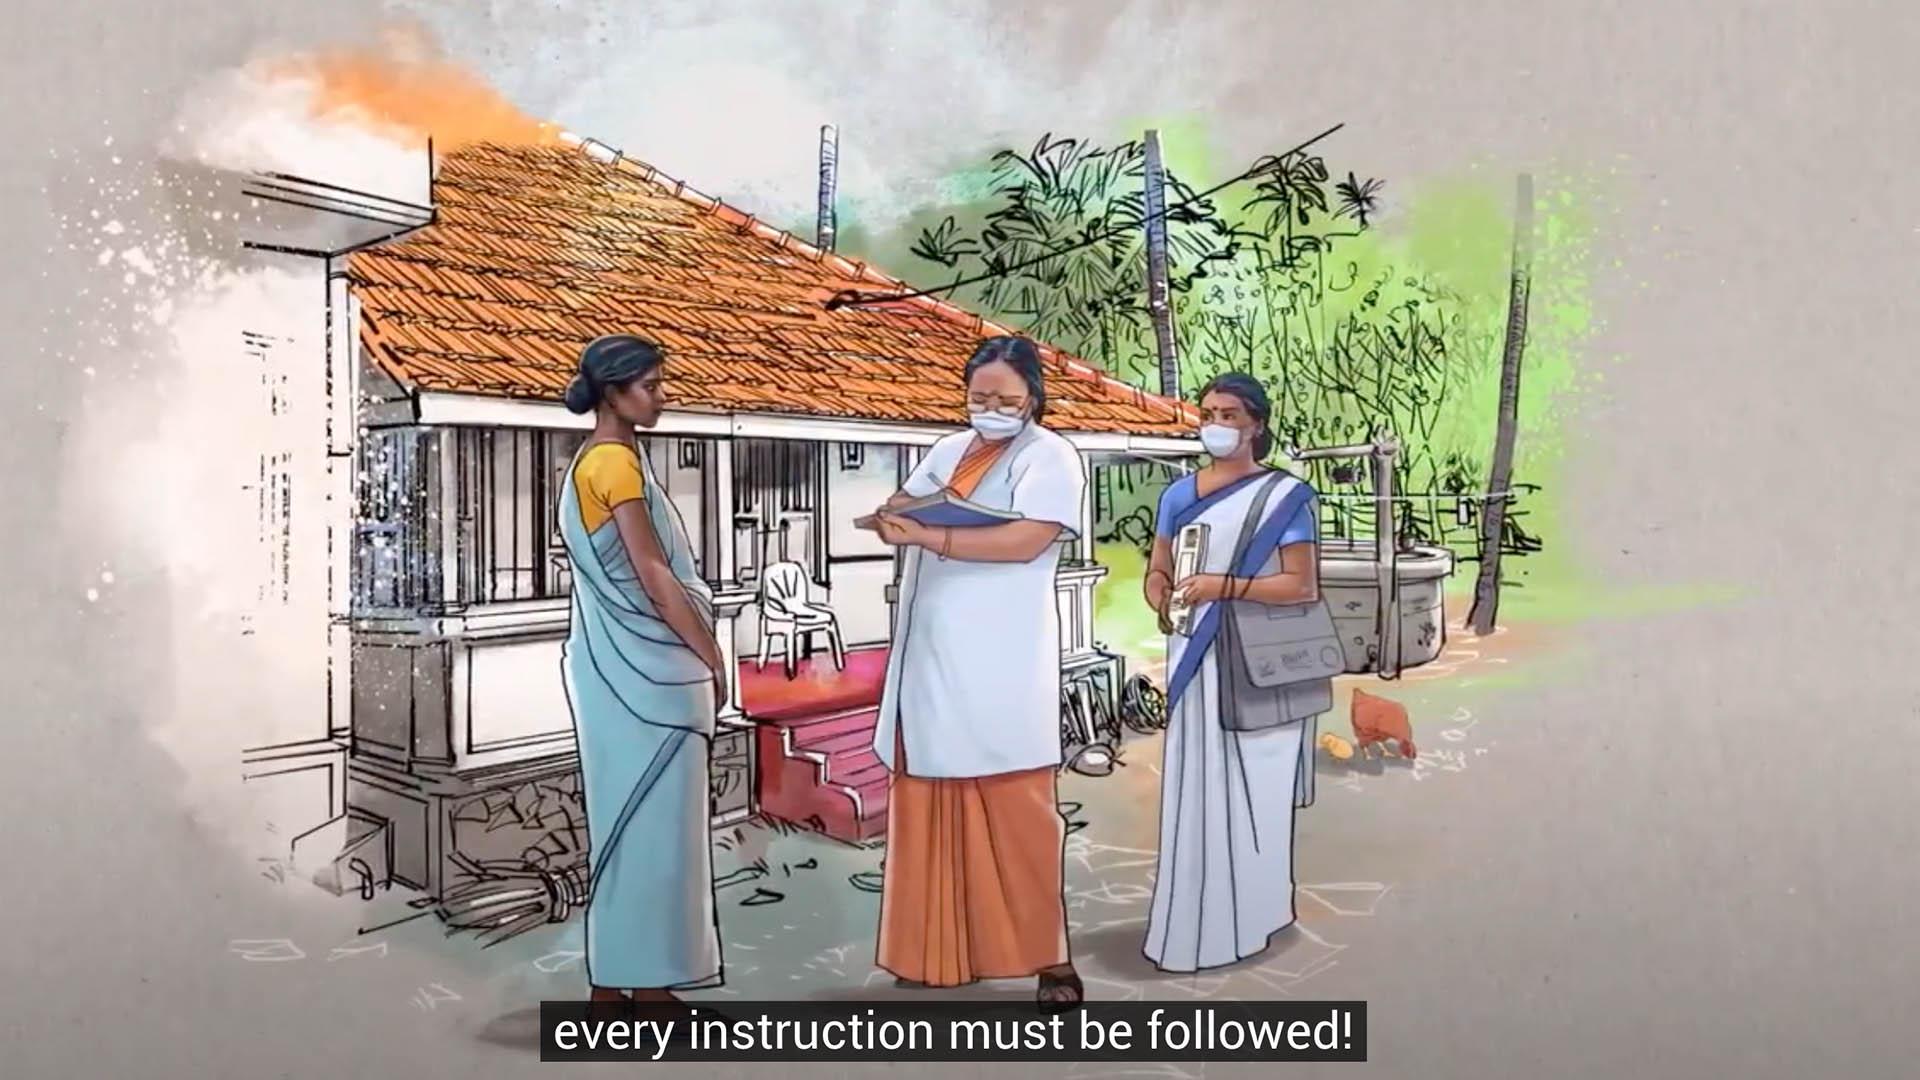 rural doctor instructing women